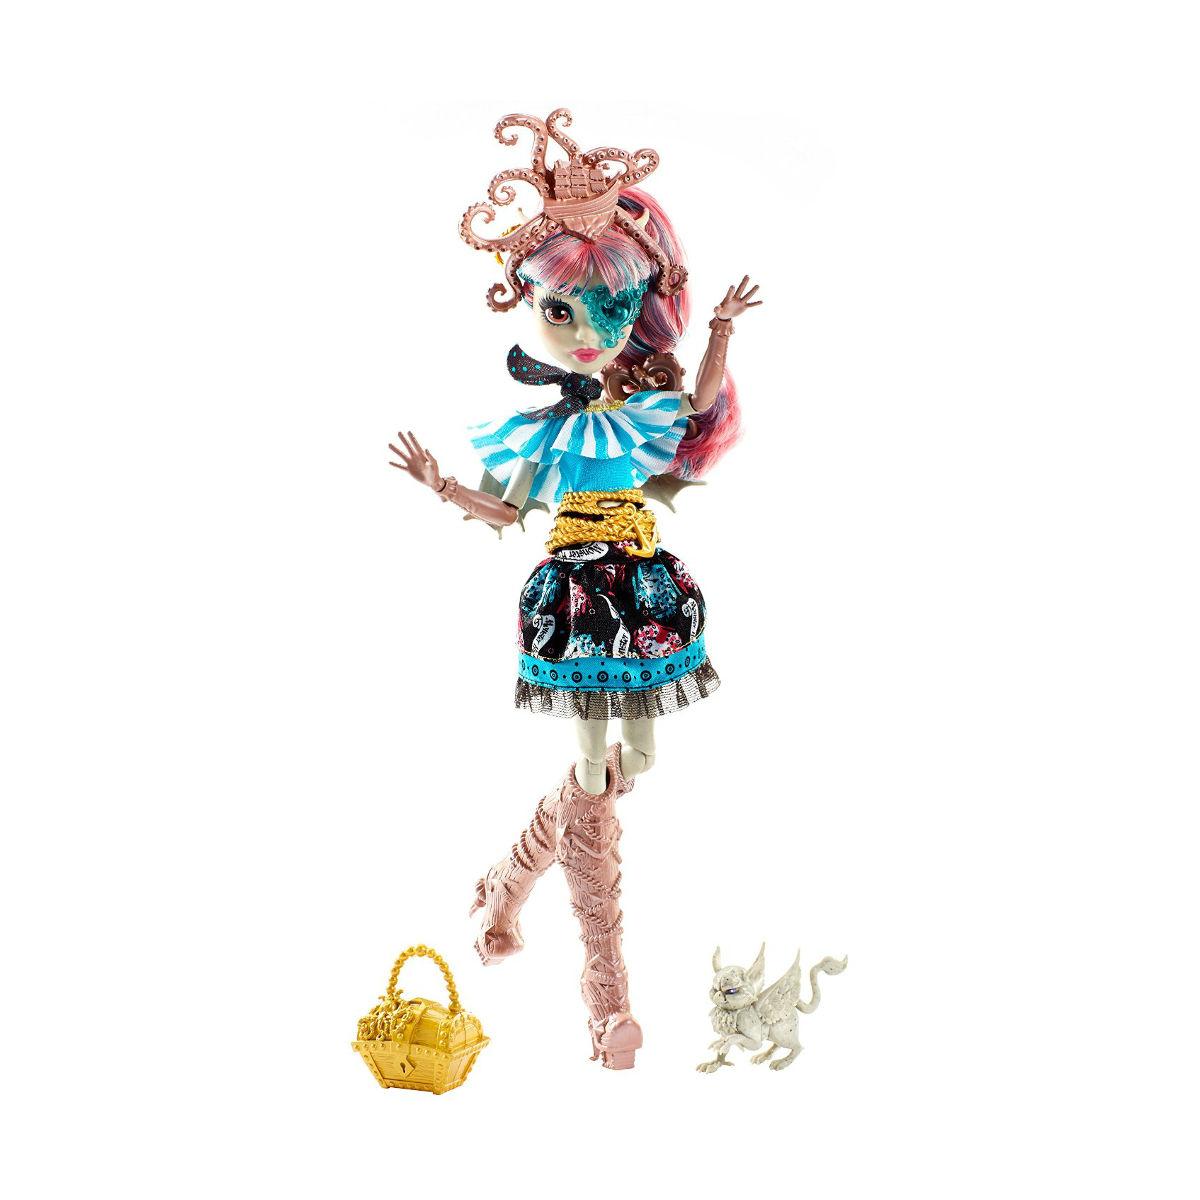 Кукла из серии Монстер Хай: Кораблекрушение - Рошель ГойлКуклы Ever After High и Monster High<br>Кукла из серии Монстер Хай: Кораблекрушение - Рошель Гойл<br>